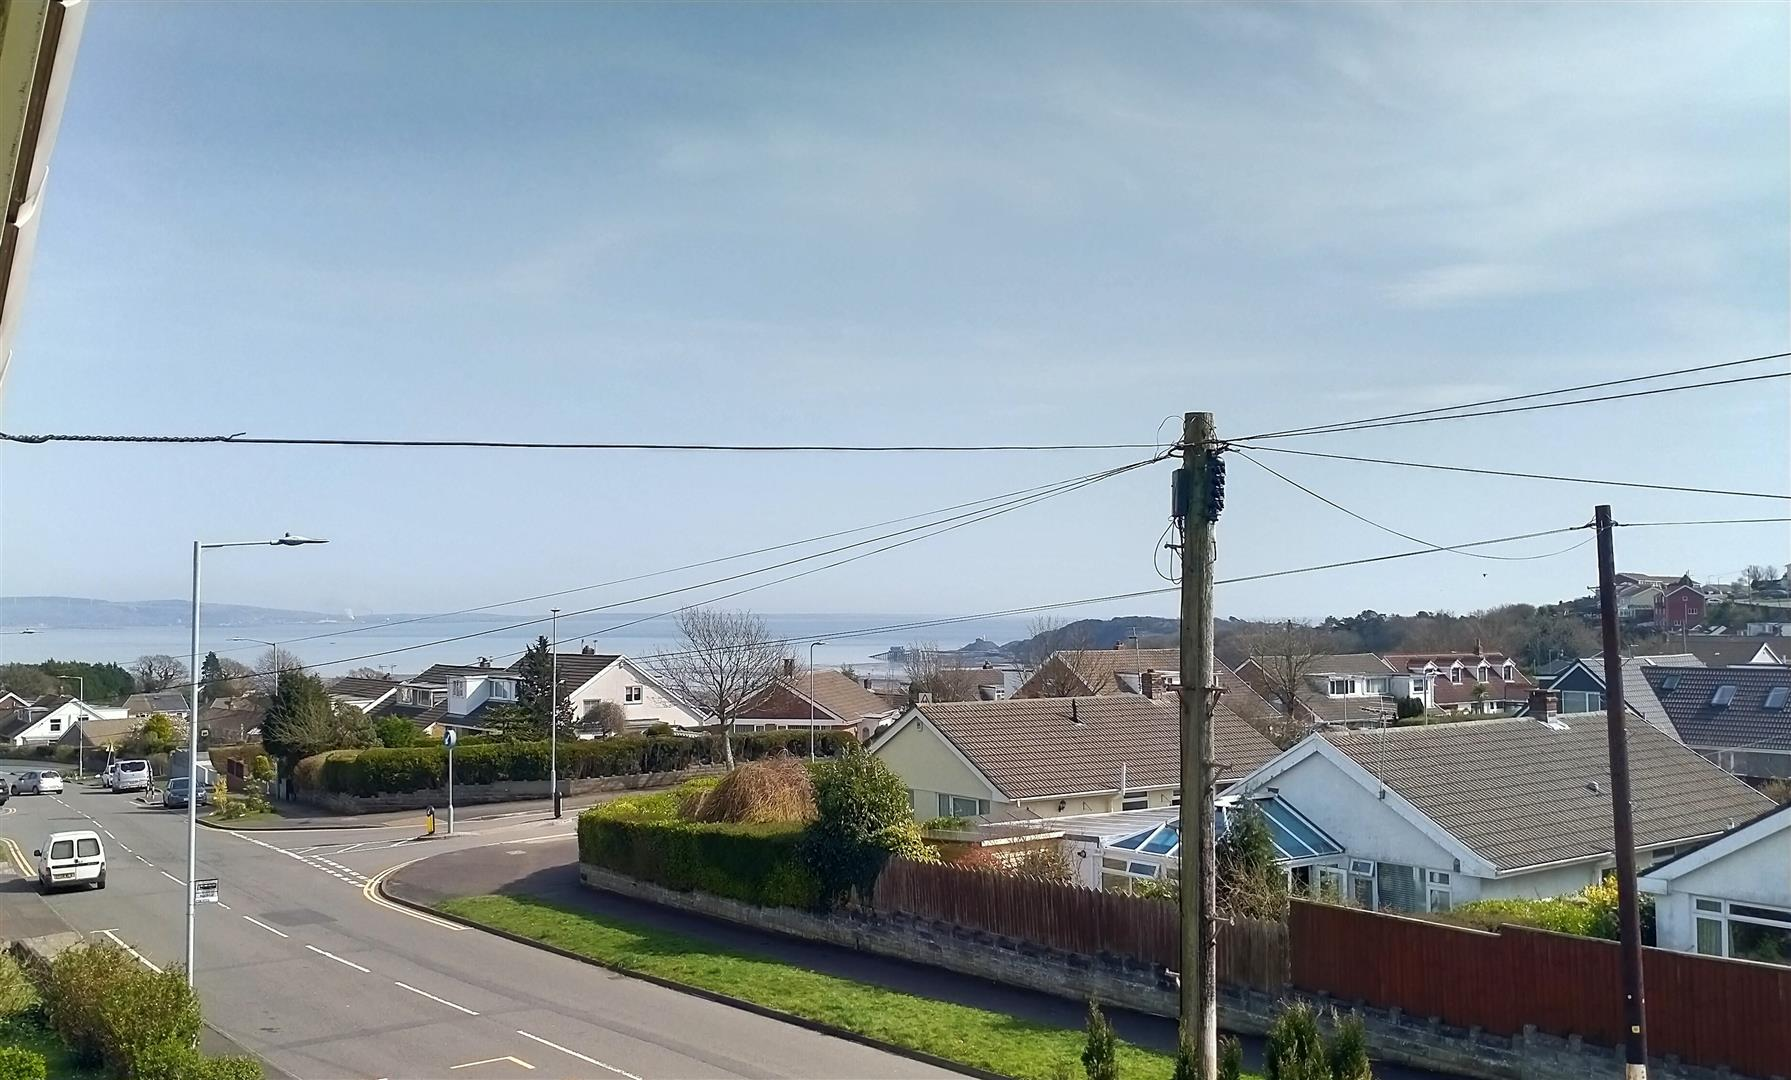 West Cross Lane, West Cross, Swansea, SA3 5NG